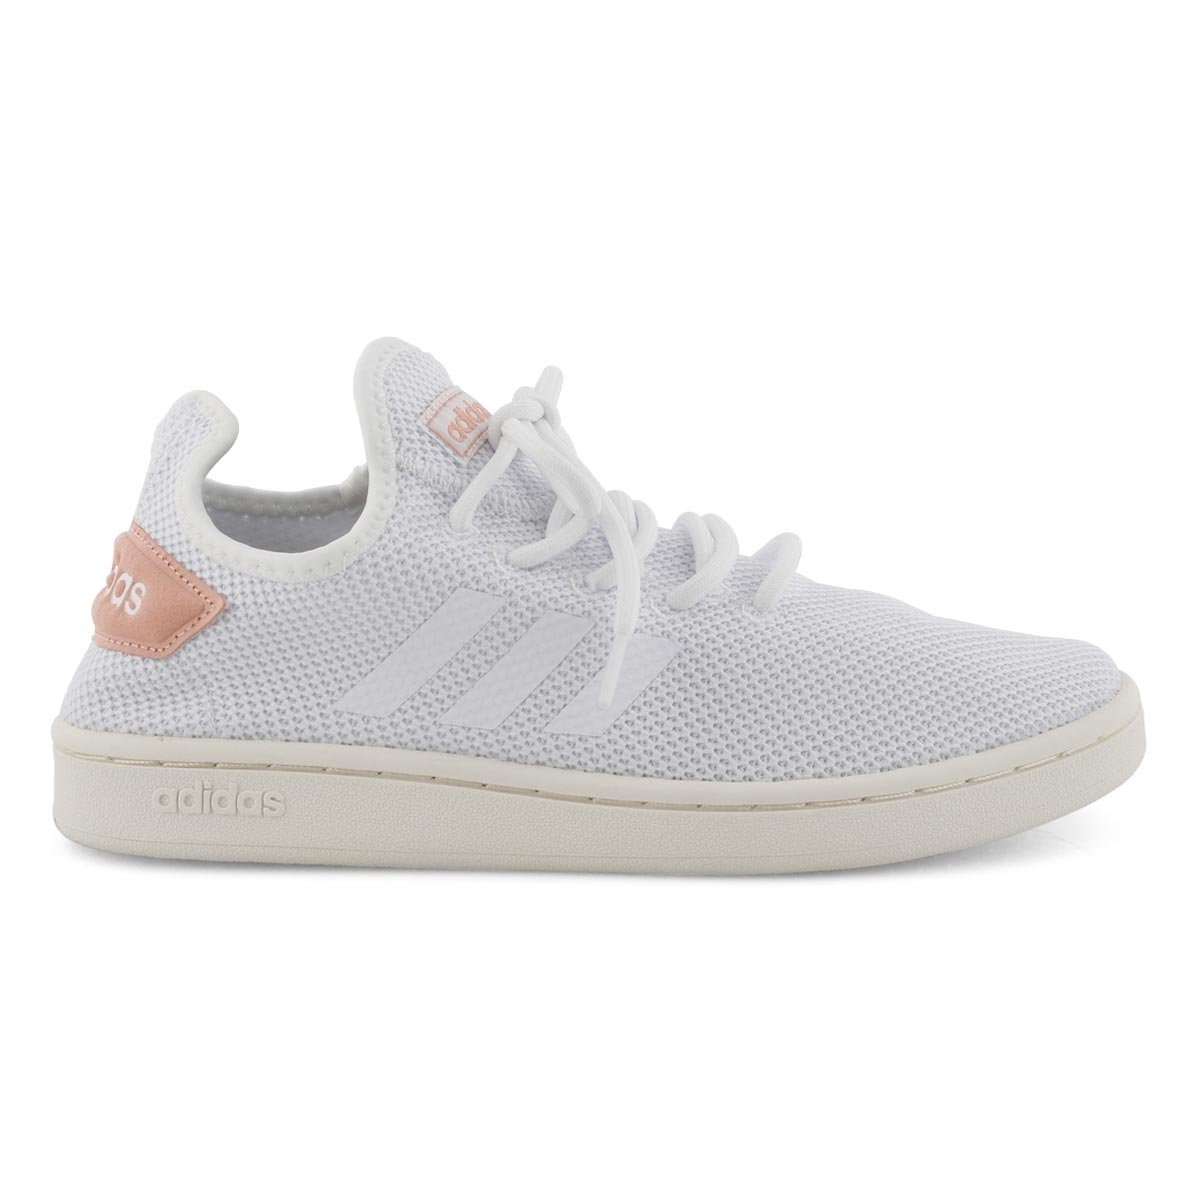 Lds Court Adapt wht/pnk running shoe